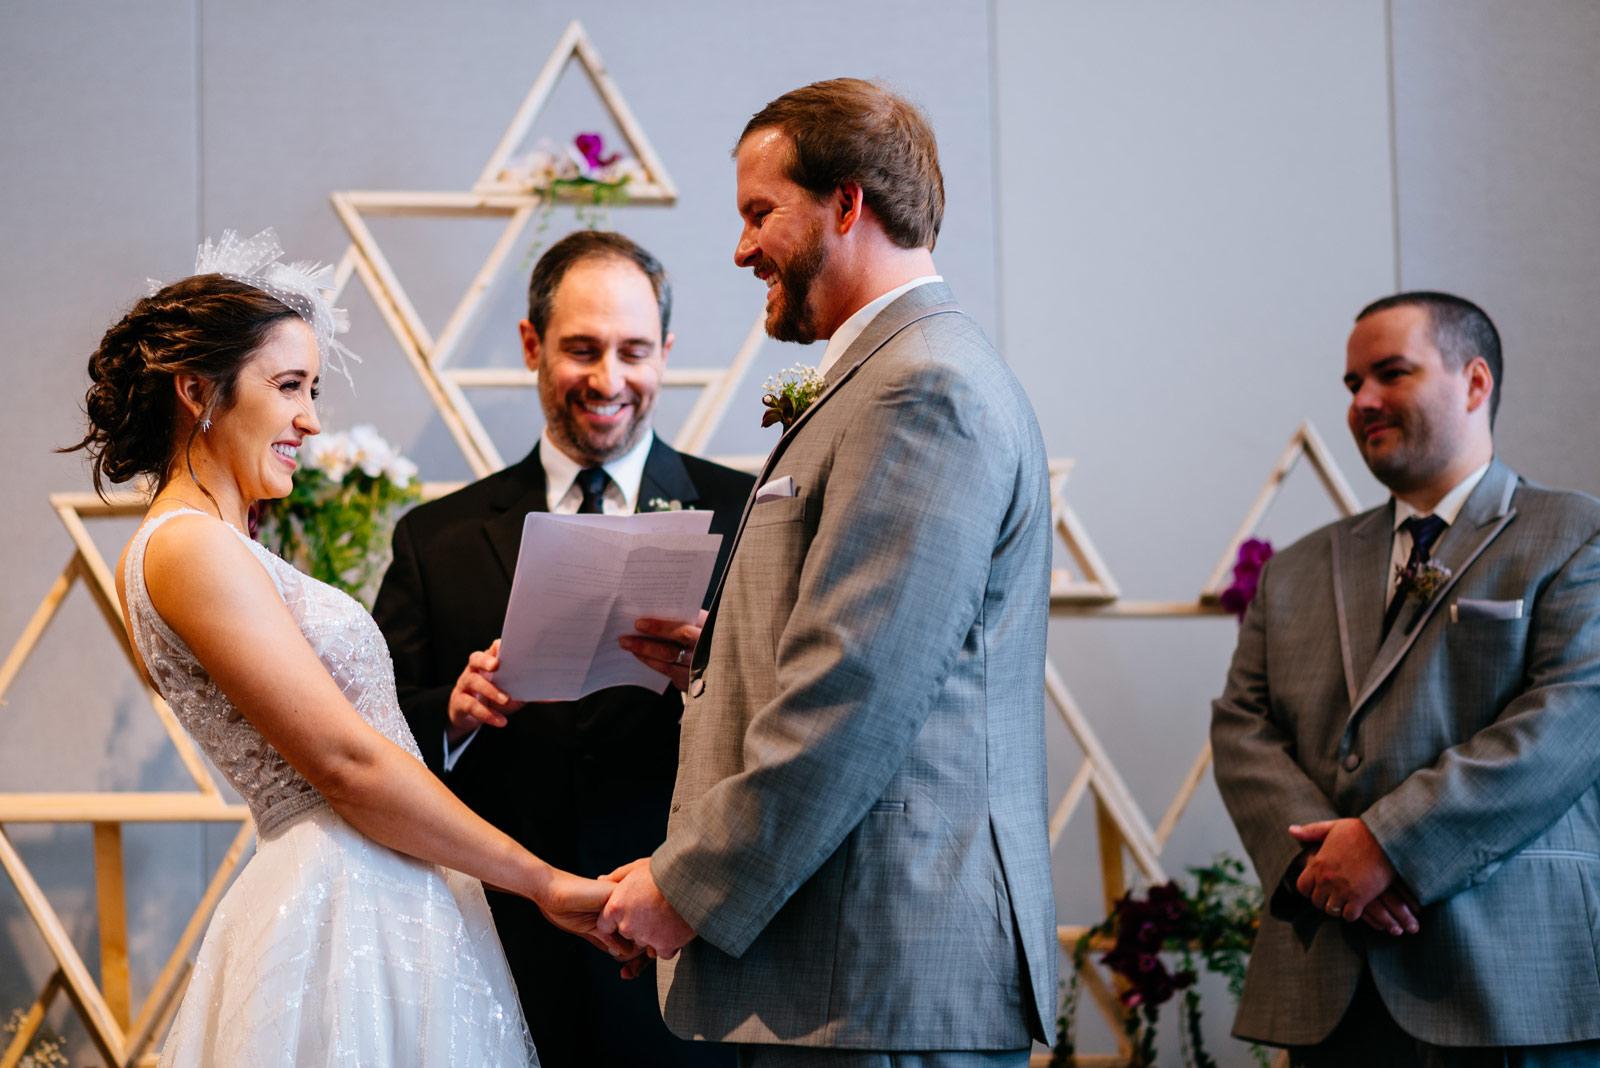 21c museum hotel wedding